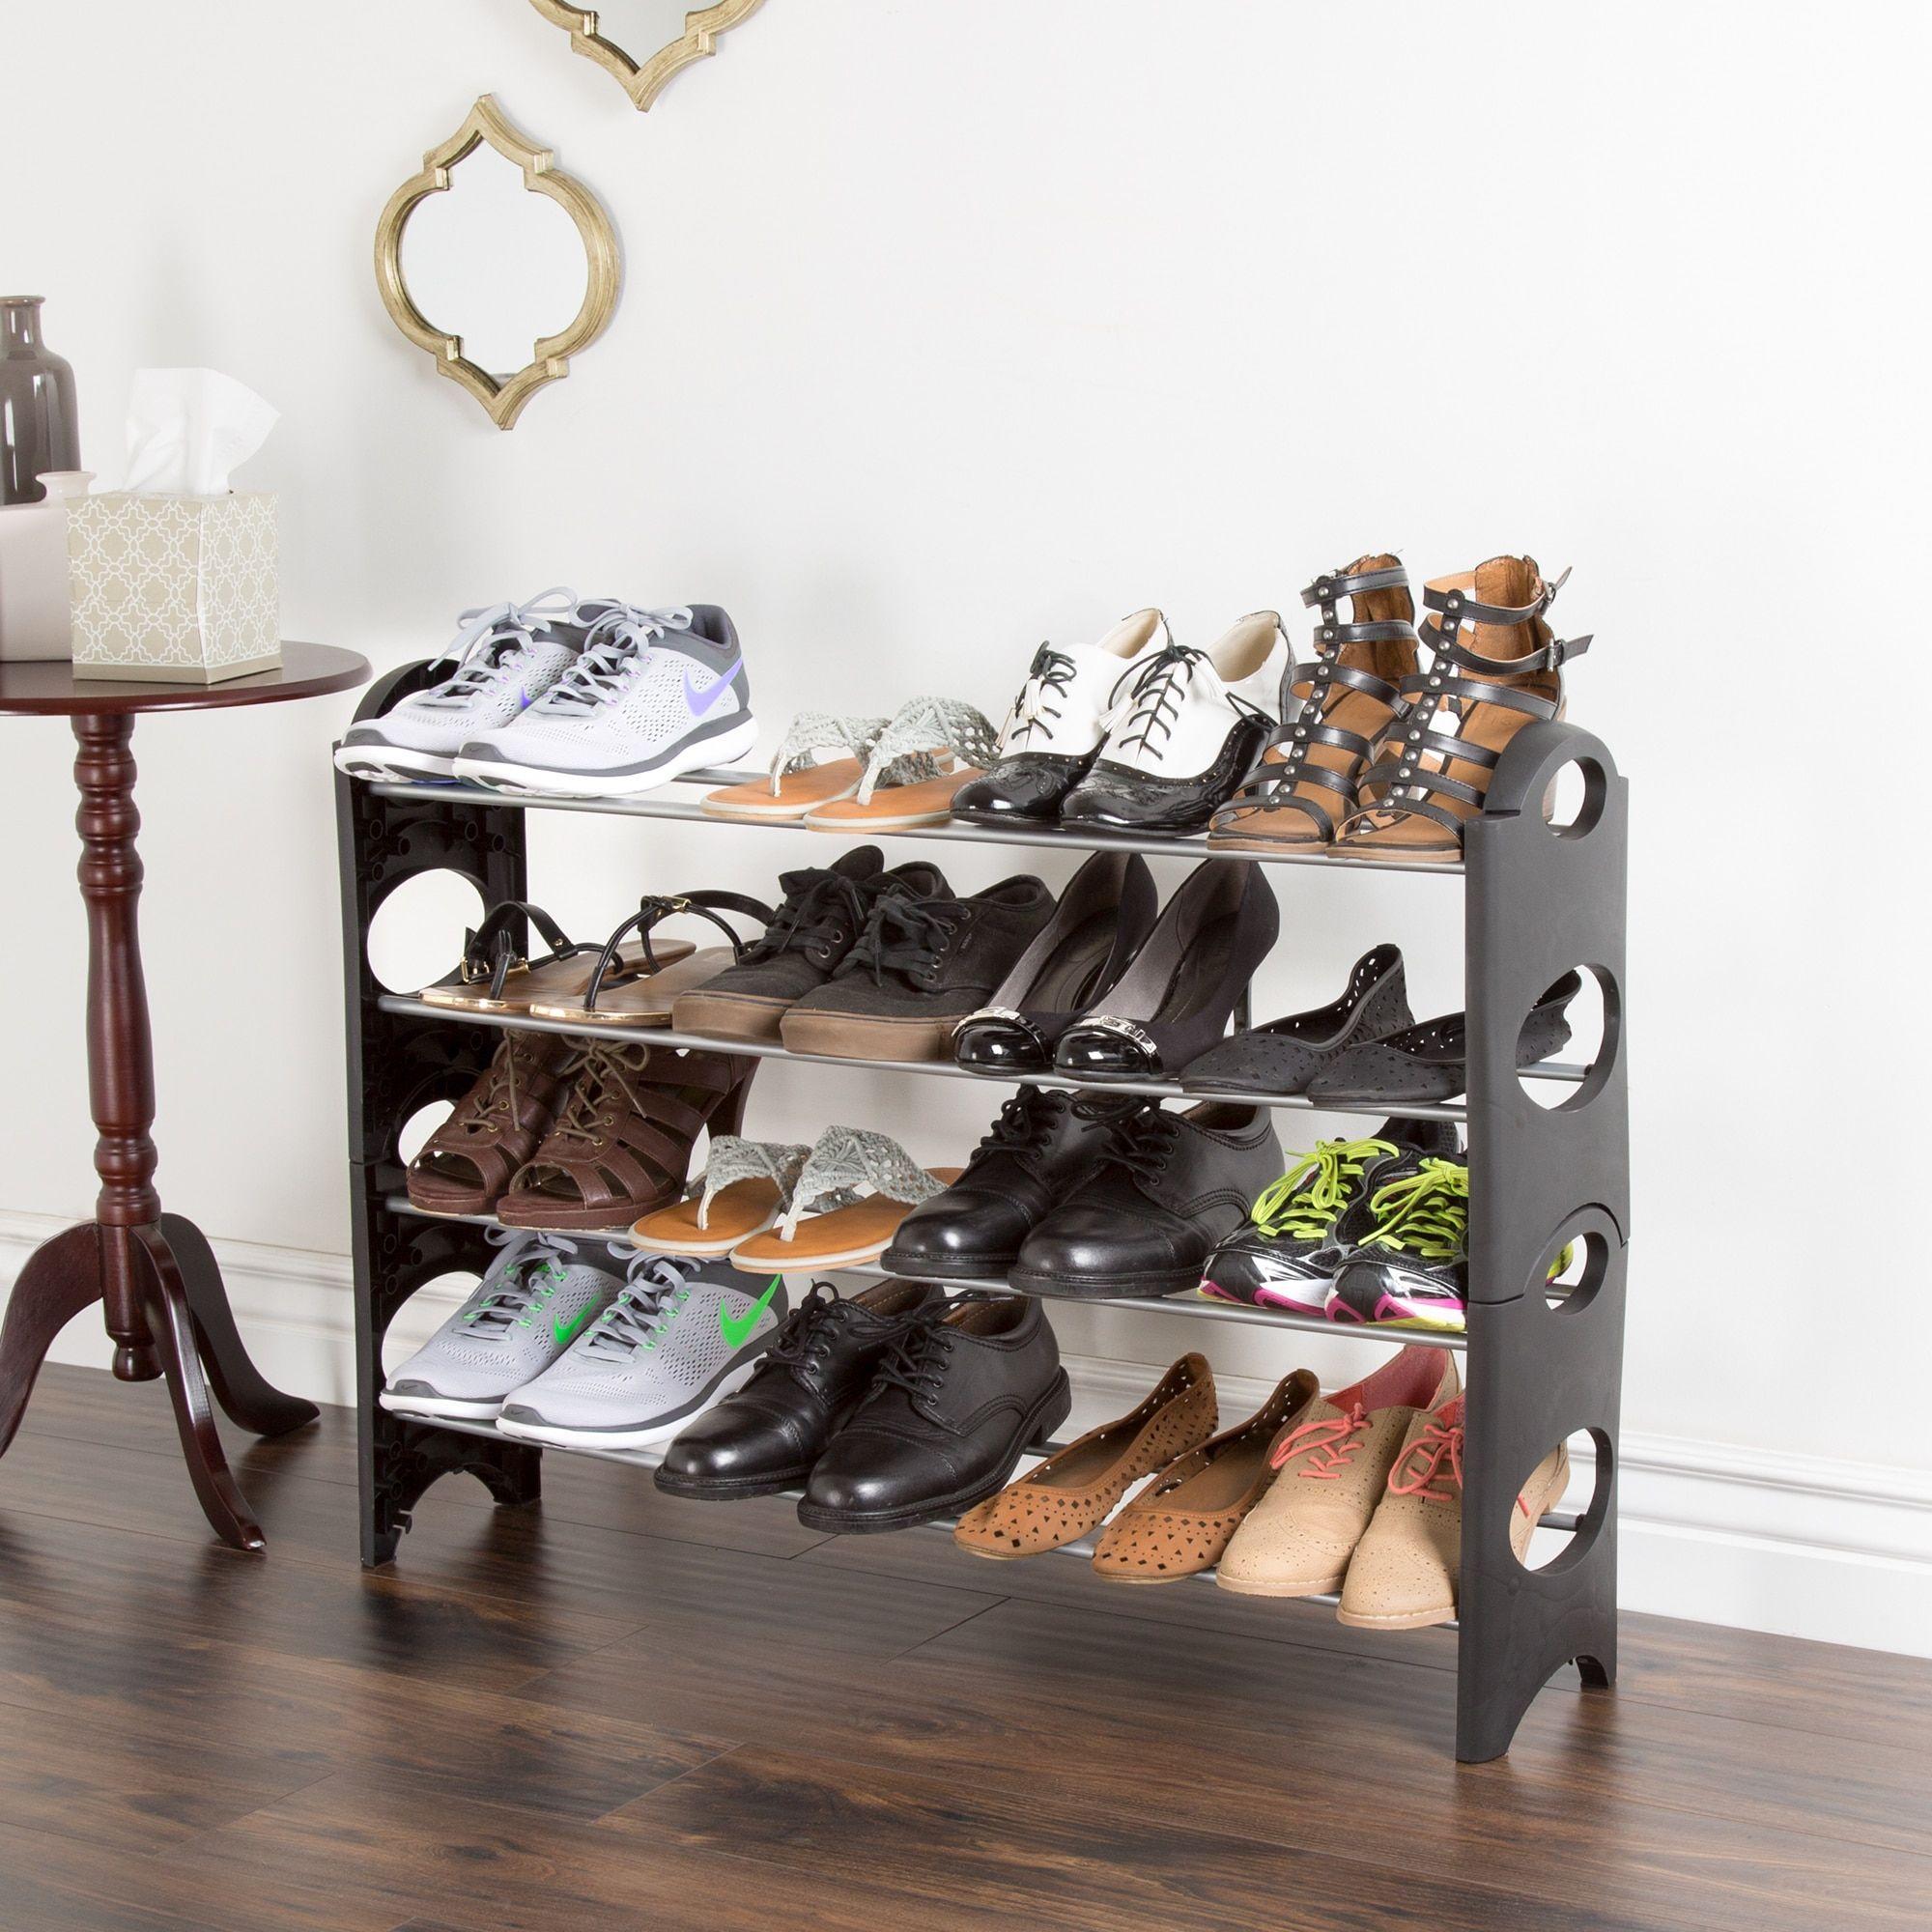 Everyday Home 4 Tier Stackable Shoe Rack 16 Pair Capacity Black